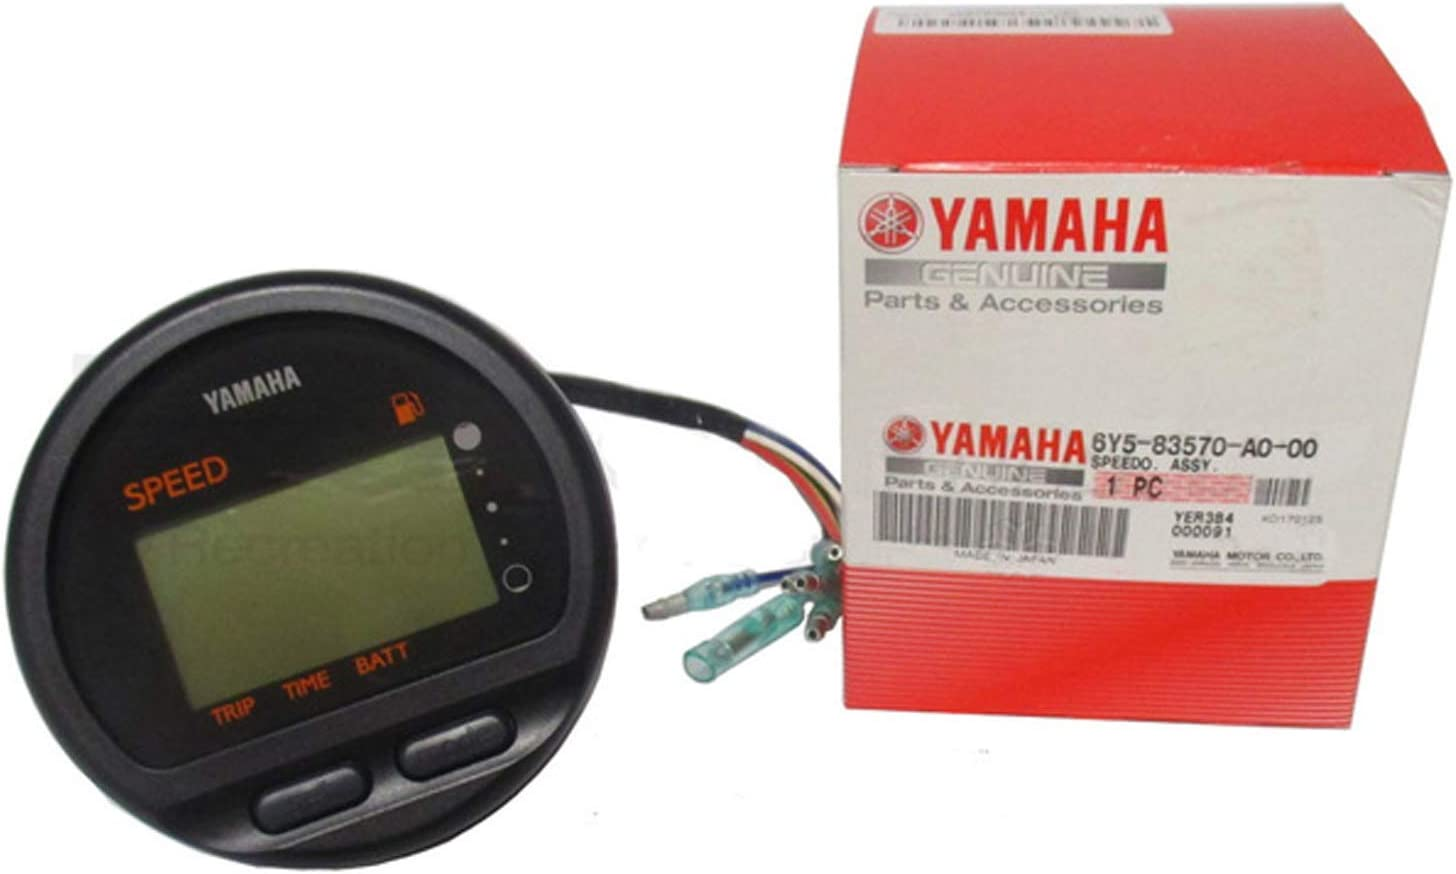 Yamaha Marine New OEM Speedometer Asy, 6Y5-83570-A0-00-9